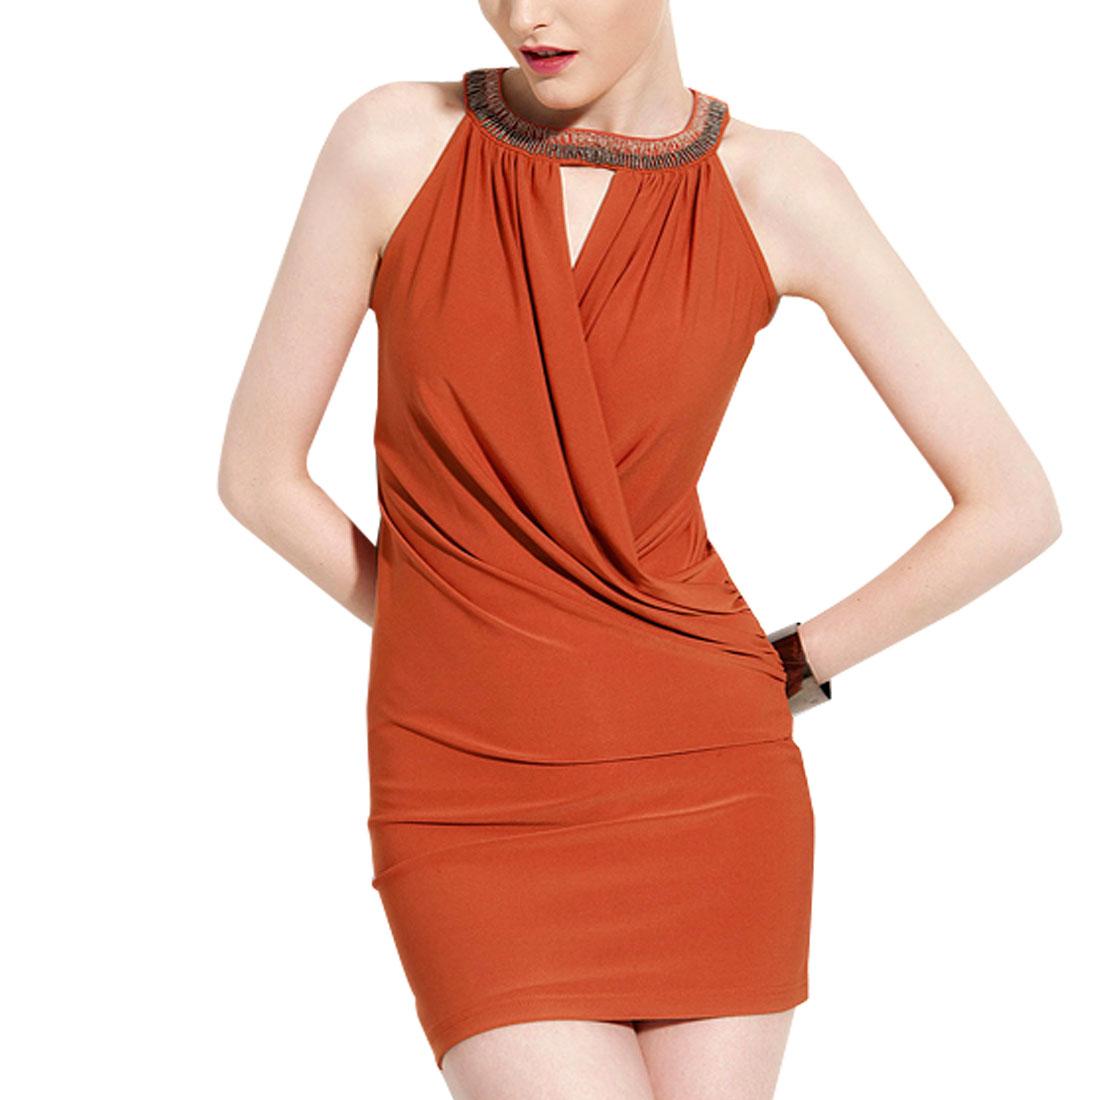 XS Round Neck Split Front Sleeveless Casual Mini Dress Dark Orange for Ladies